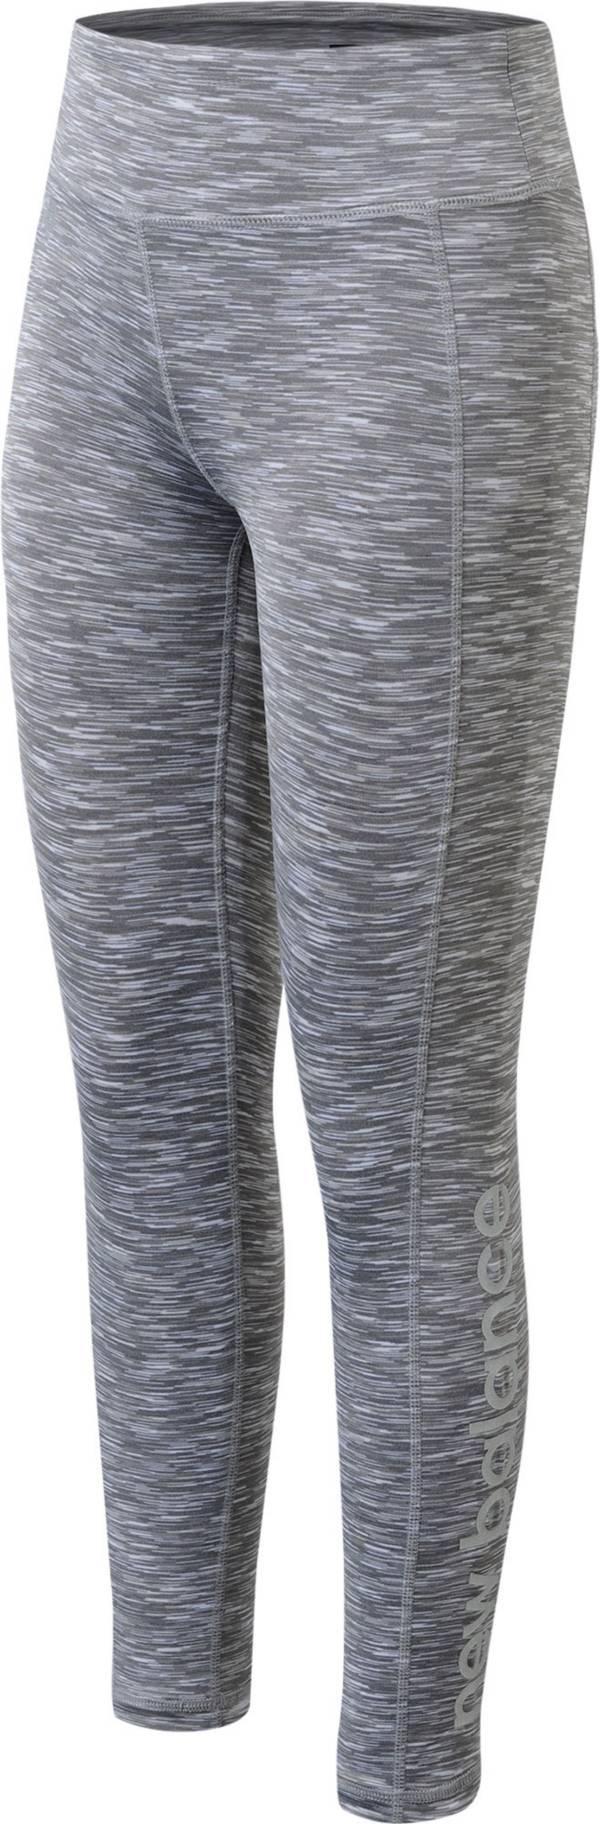 New Balance Girls' Performance Leggings product image